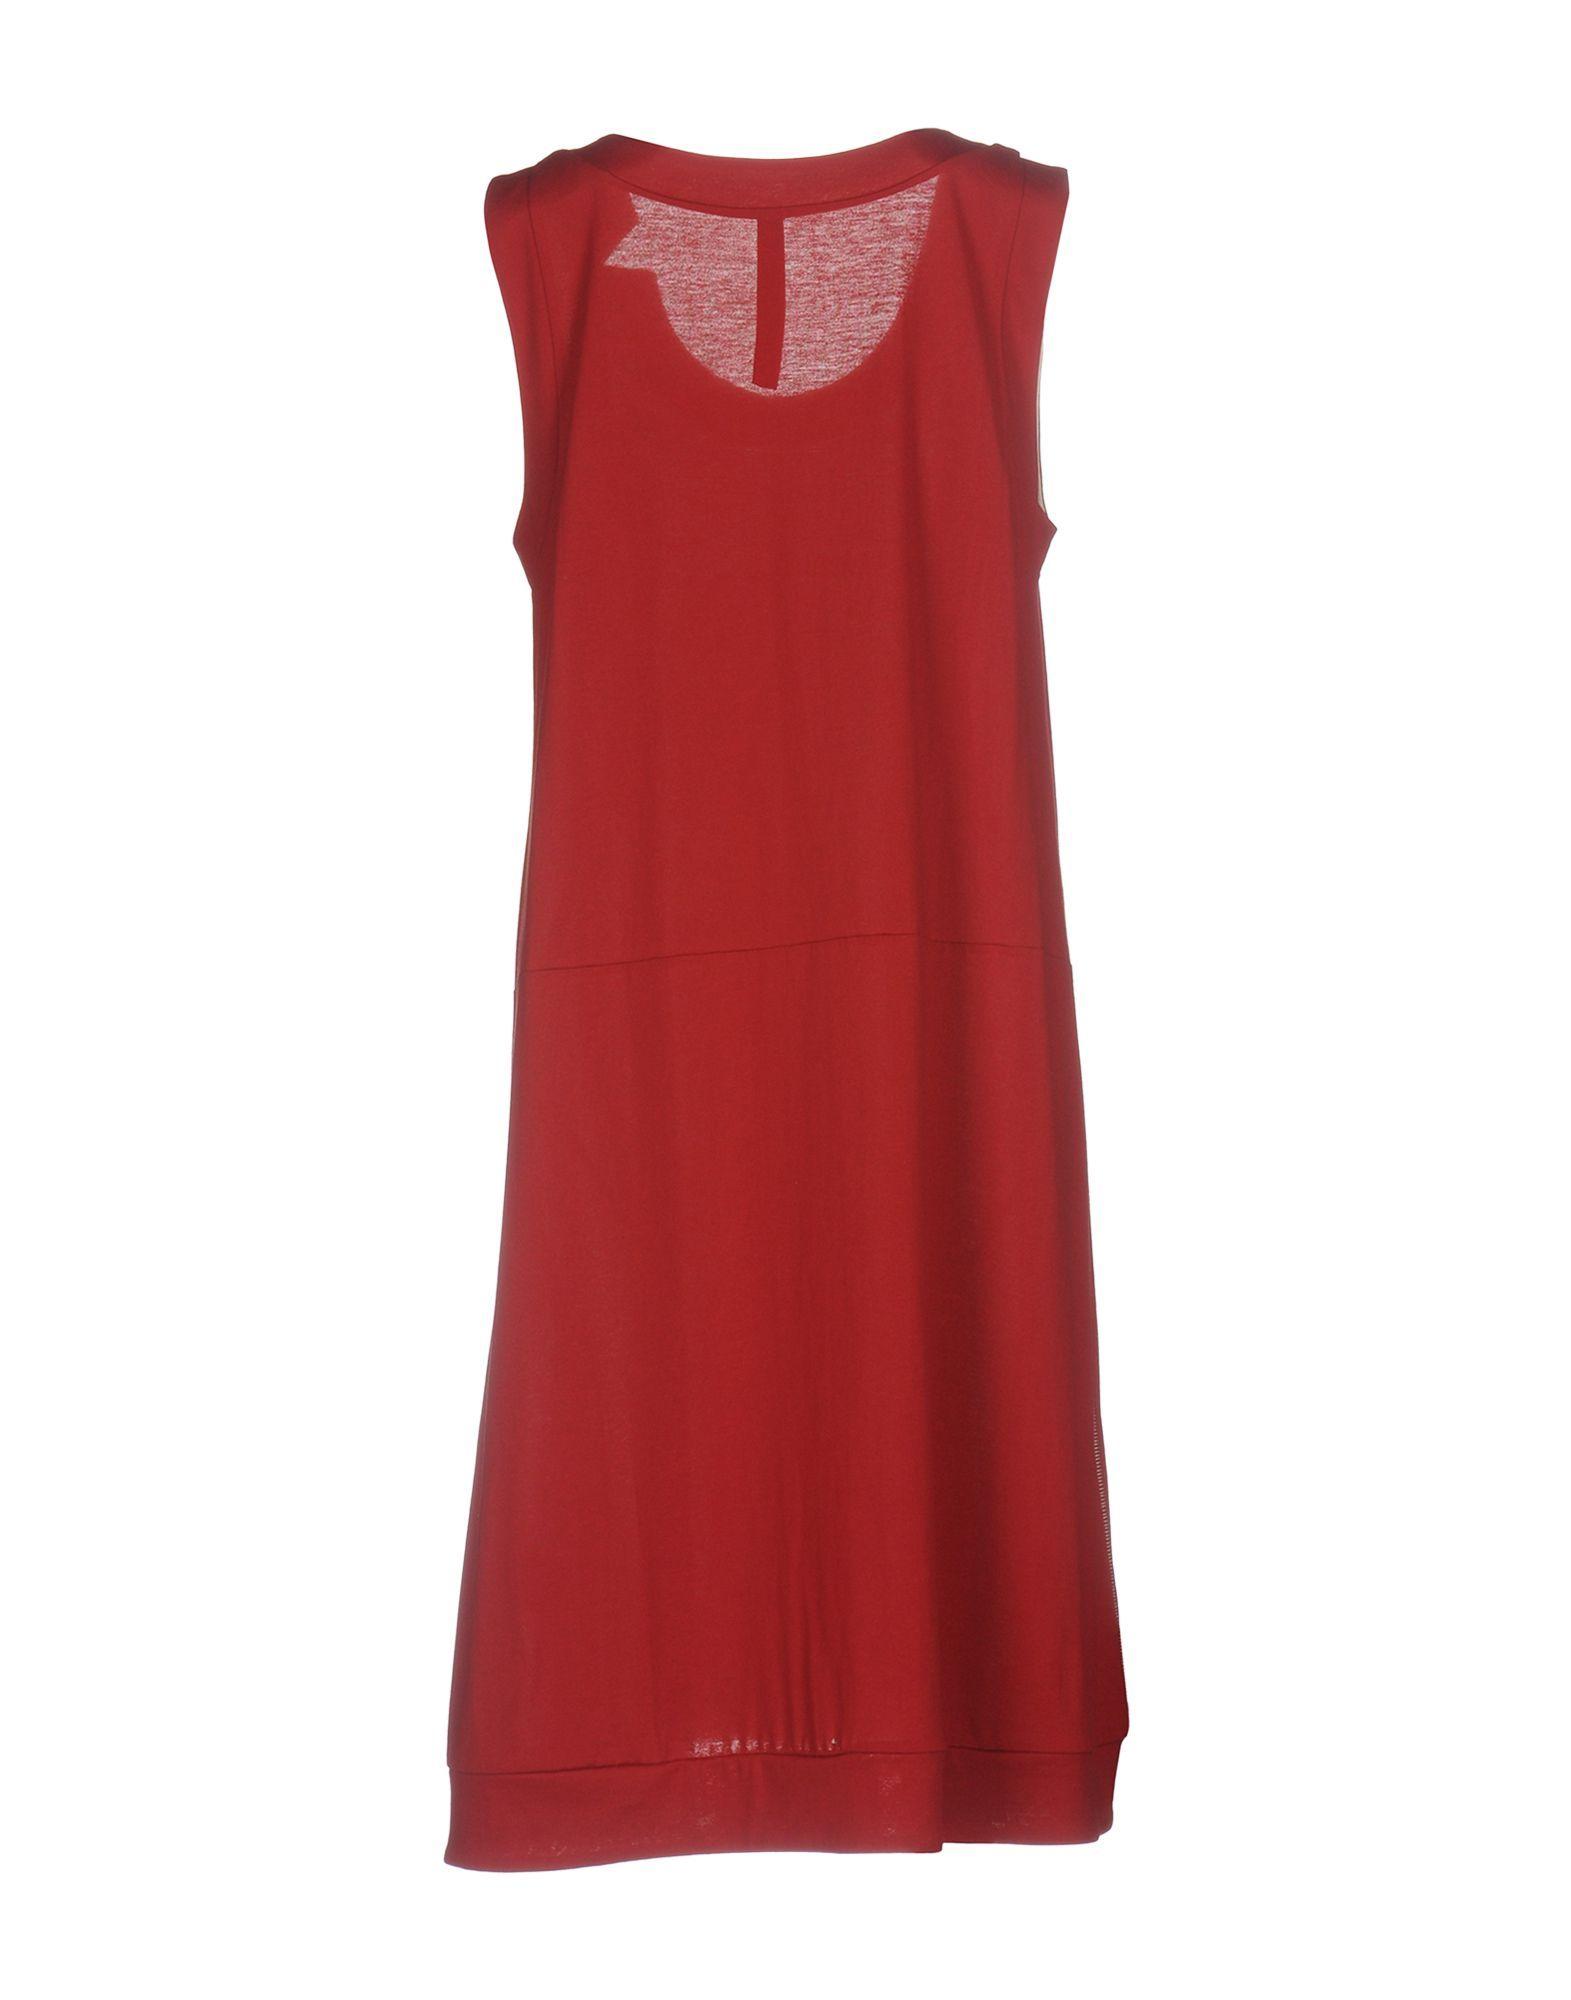 Dress Liviana Conti Brick Red Women's Cotton